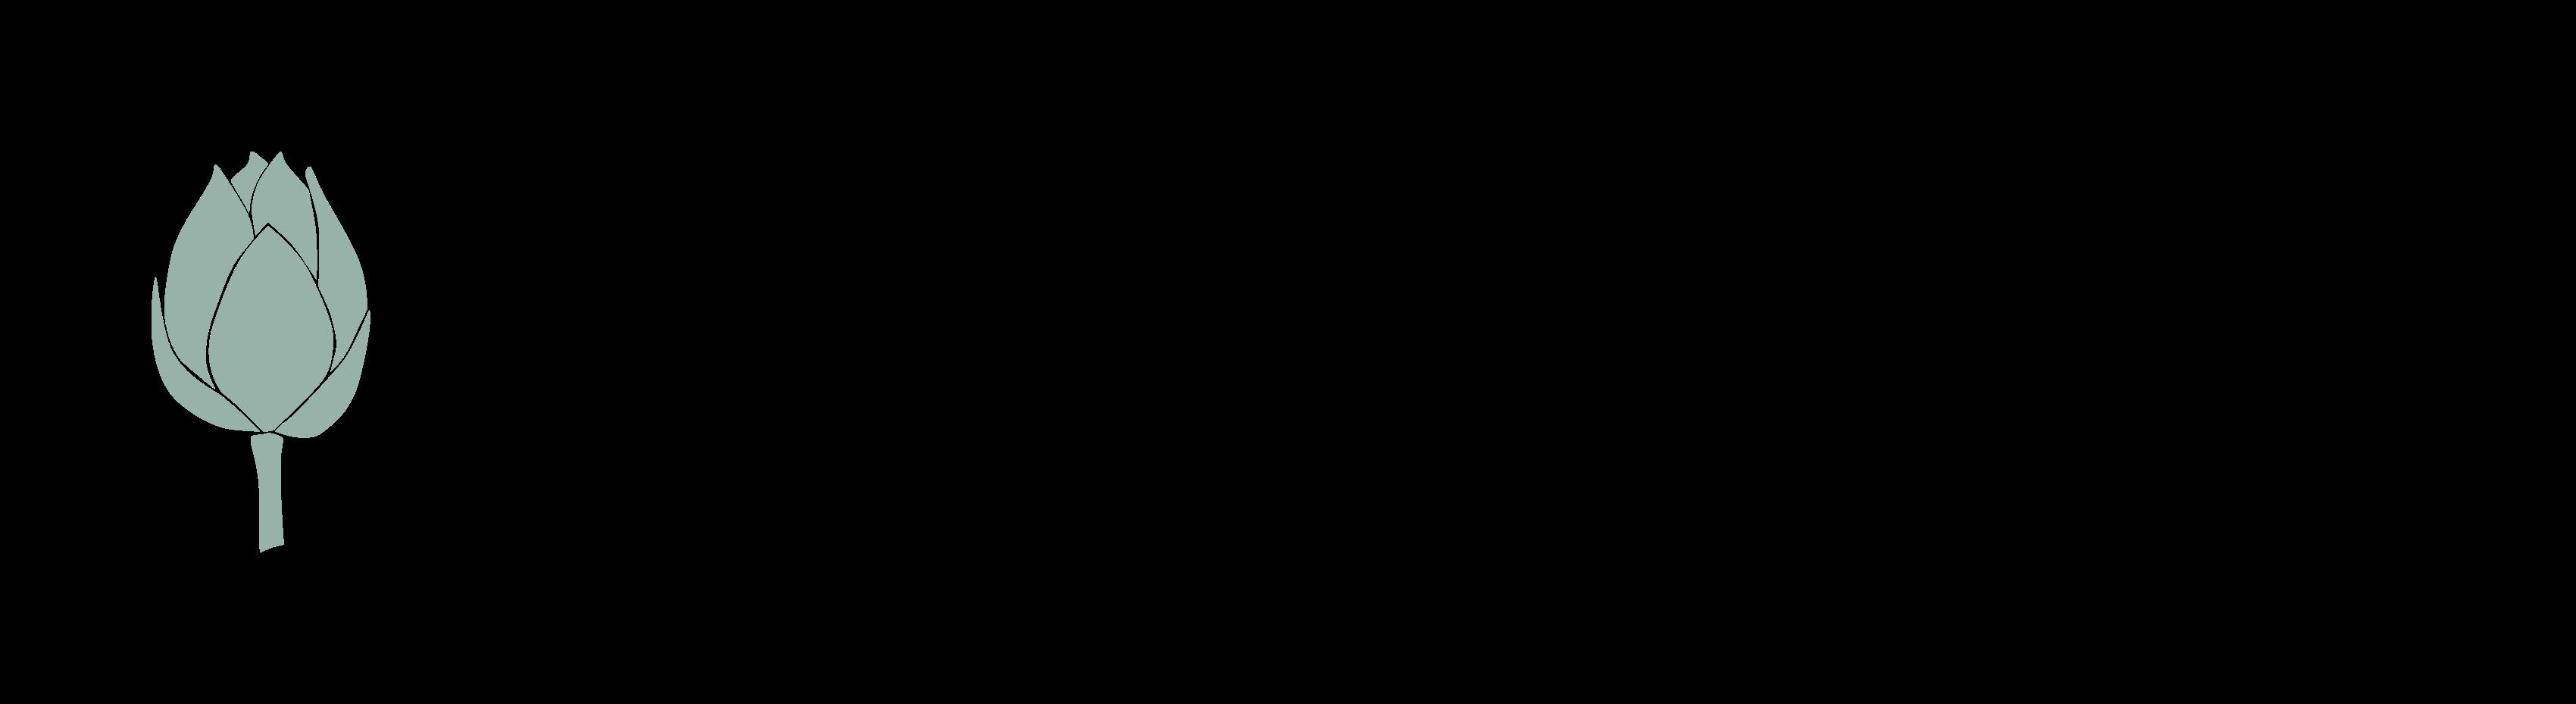 Logo Hebammen Aller-Anfang Titel